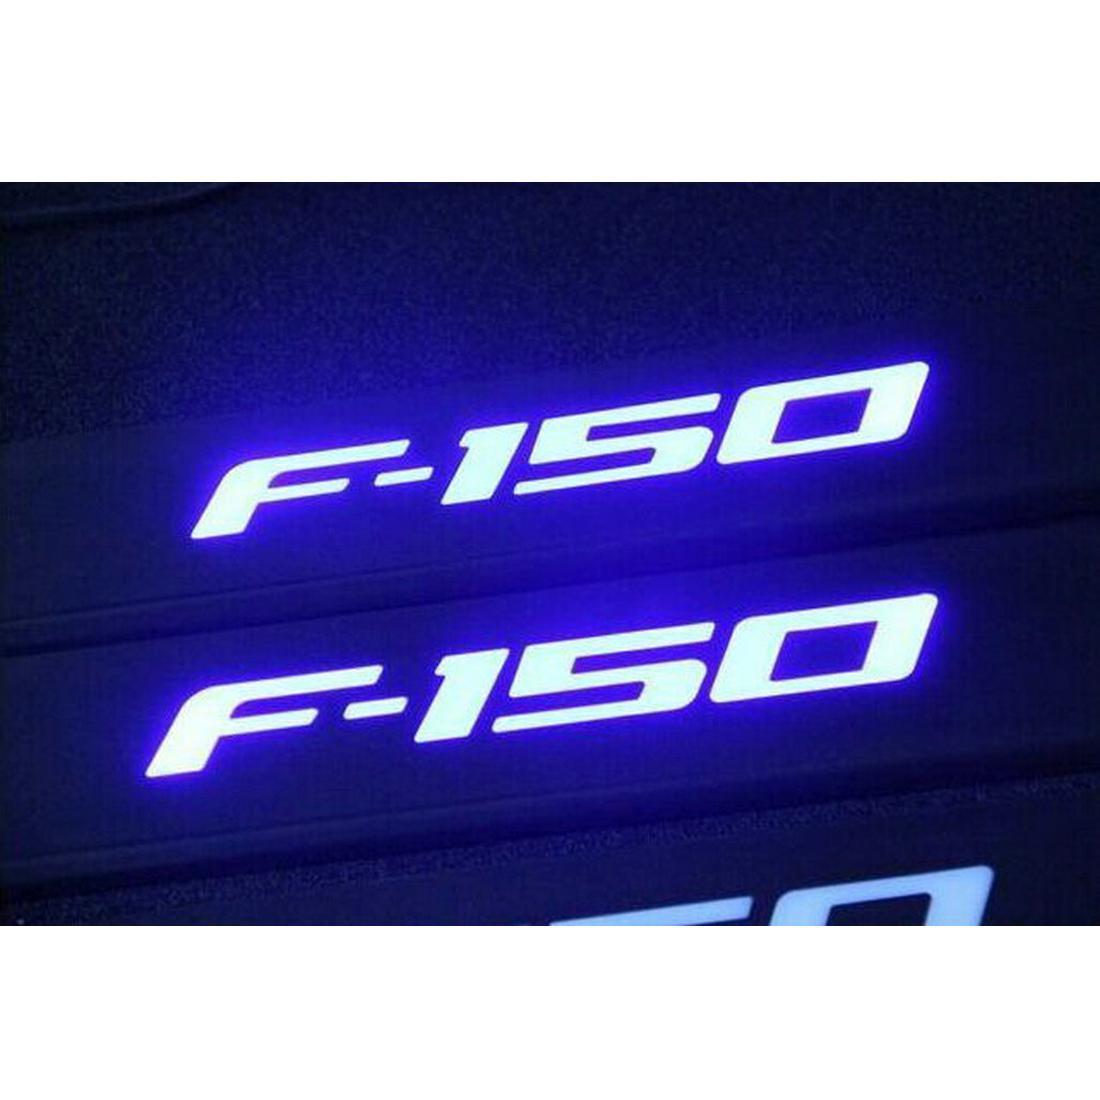 US ライトガード プロテクター 09~15フォードF-150 LEDライト4ドアステンレススカーフプレートドアシルバーガードブルー For 09-15 Ford F-150 LED Light 4 Door Stainless Scuff Plate Door Sill Guard Blue